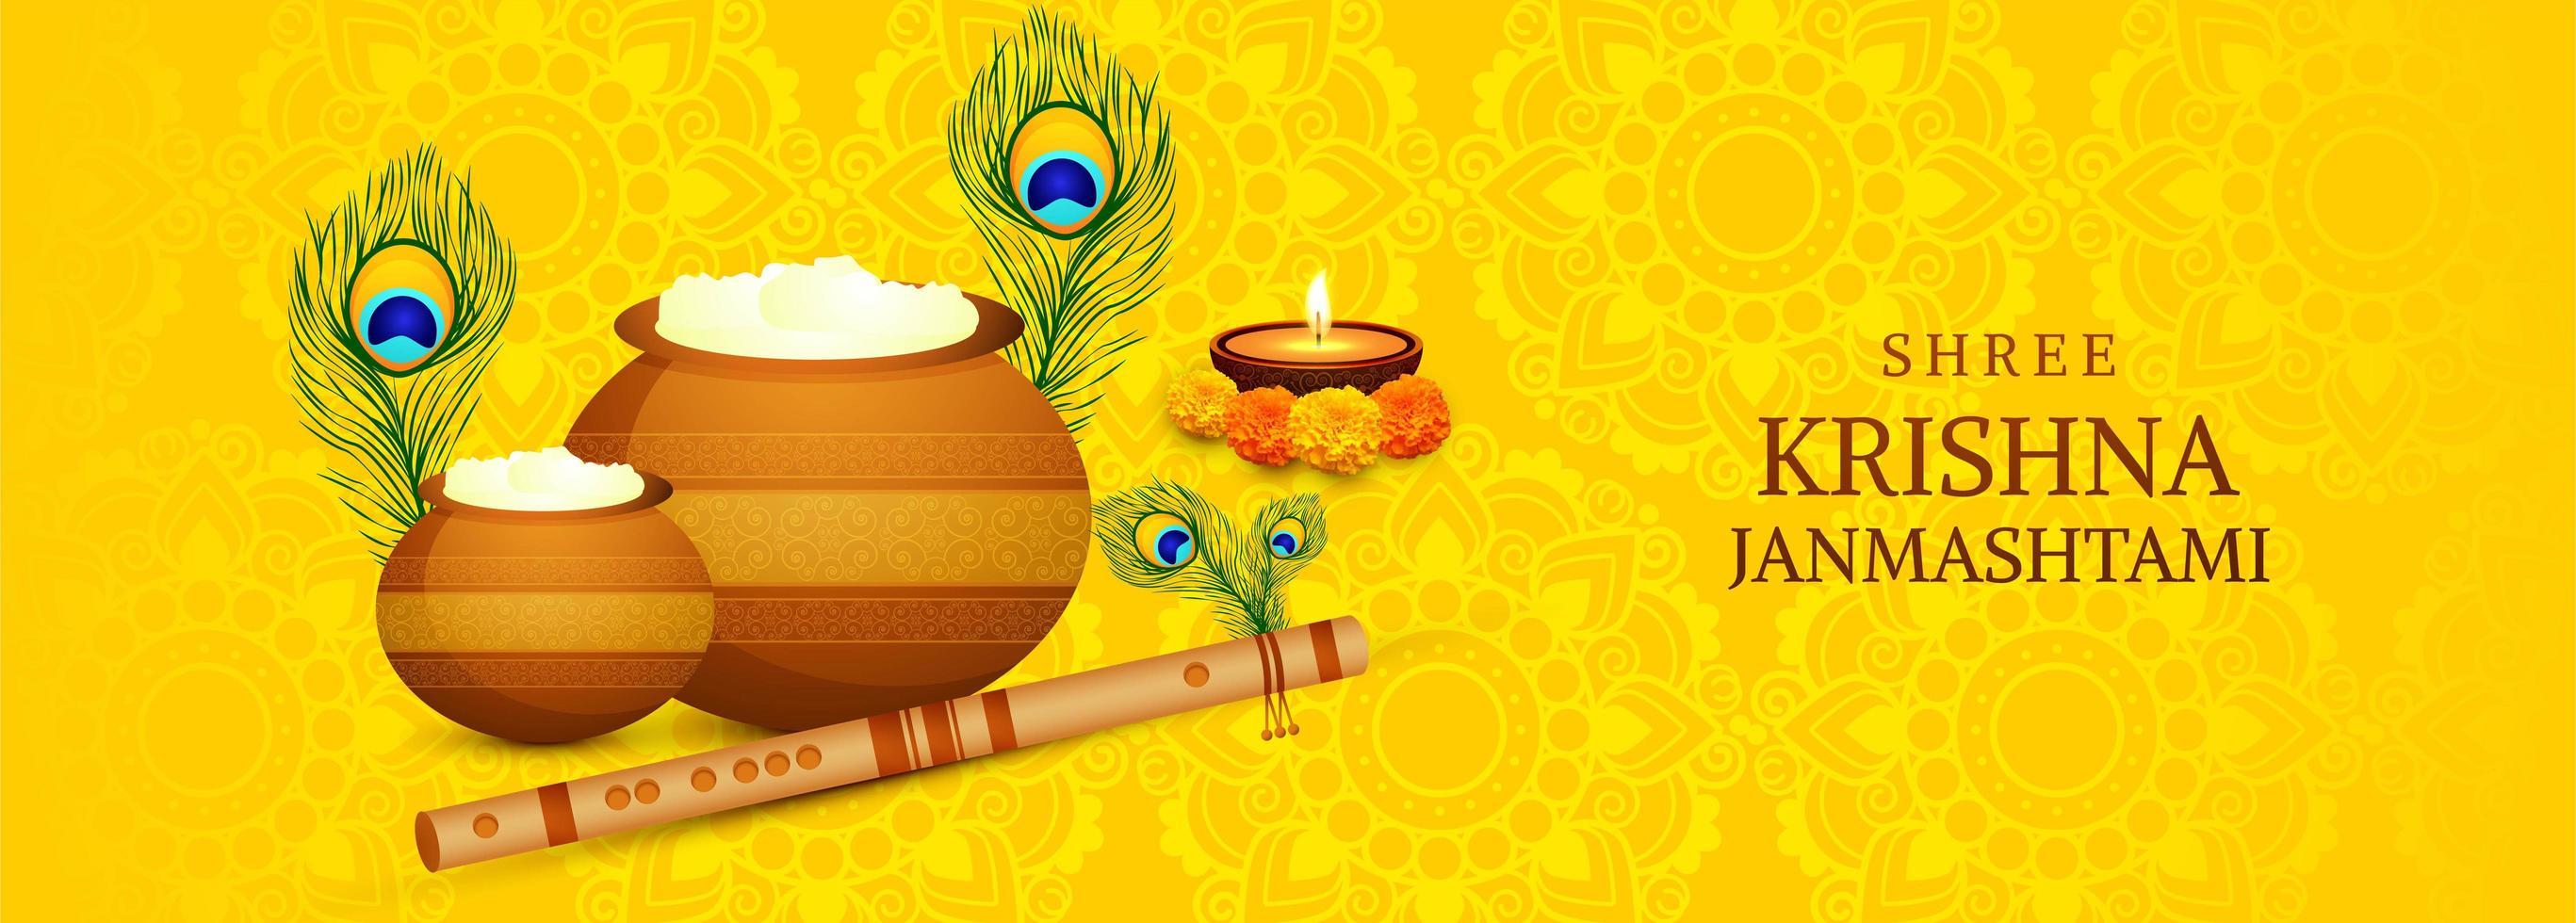 tarjeta del festival shree krishna janmashtami con banner de ollas vector